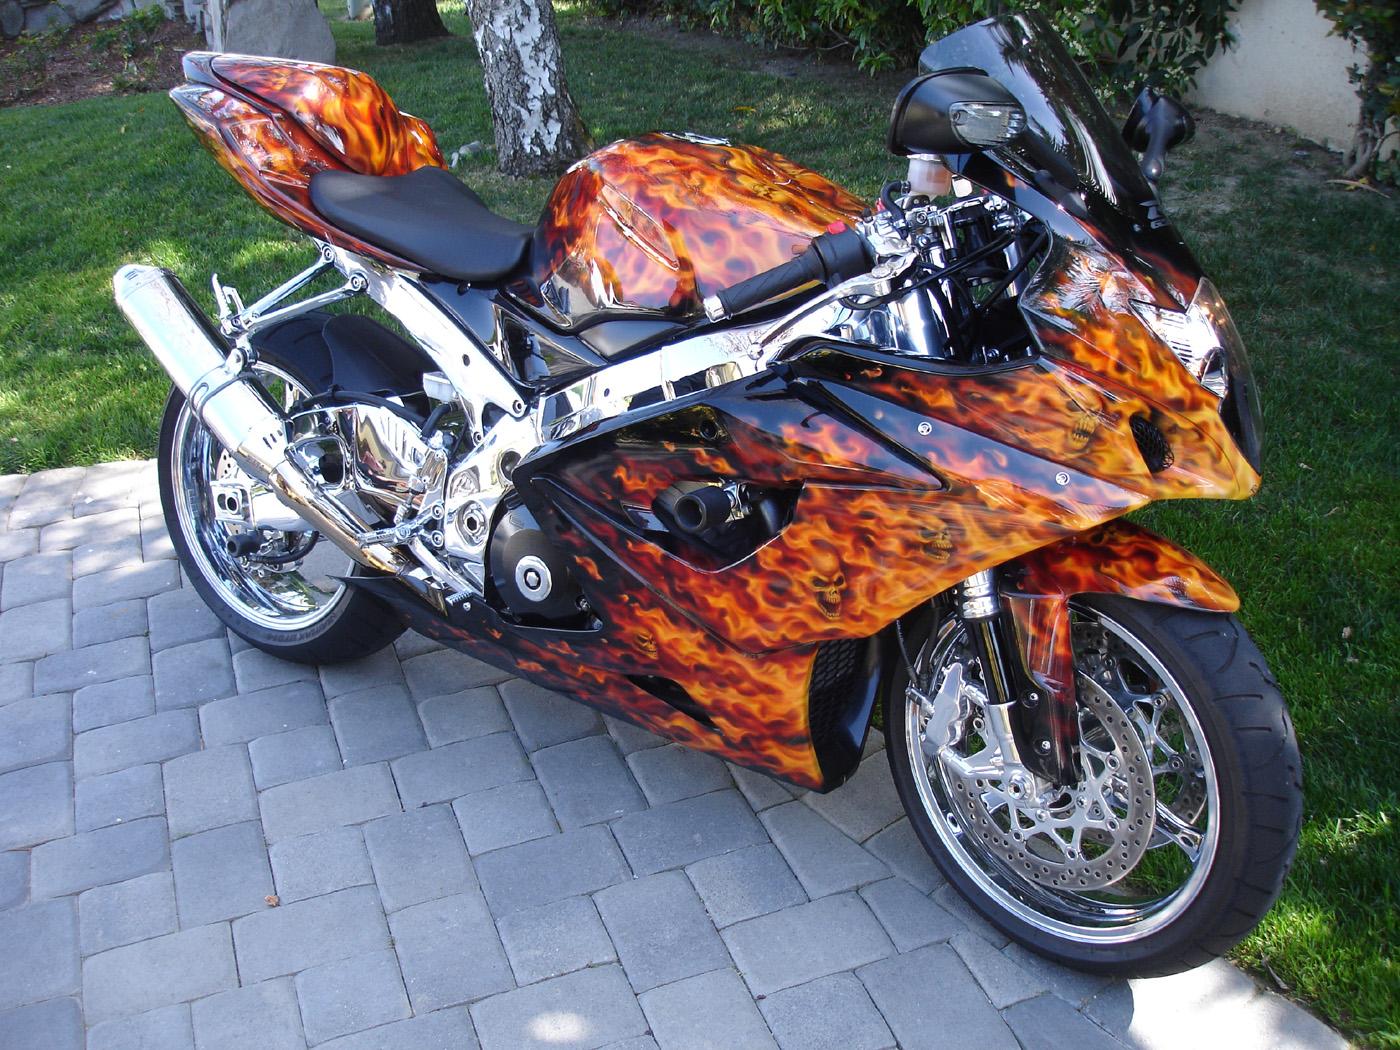 Awesome Bike Paint Jobs